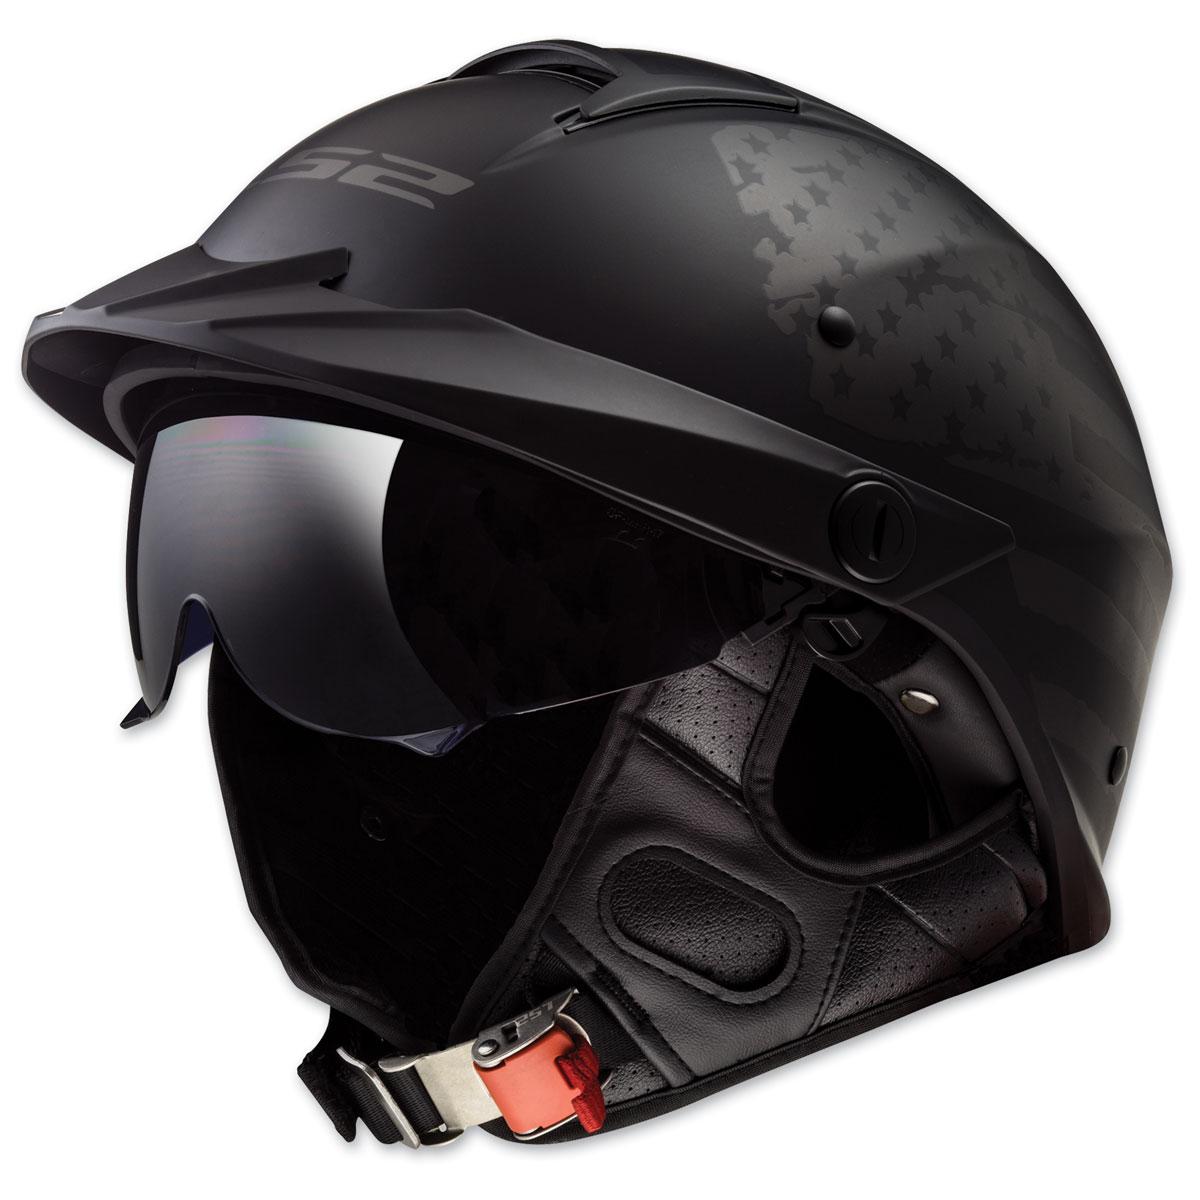 GMAX HH-65 Naked Half Helmet - 72-5443S | JPCycles.com